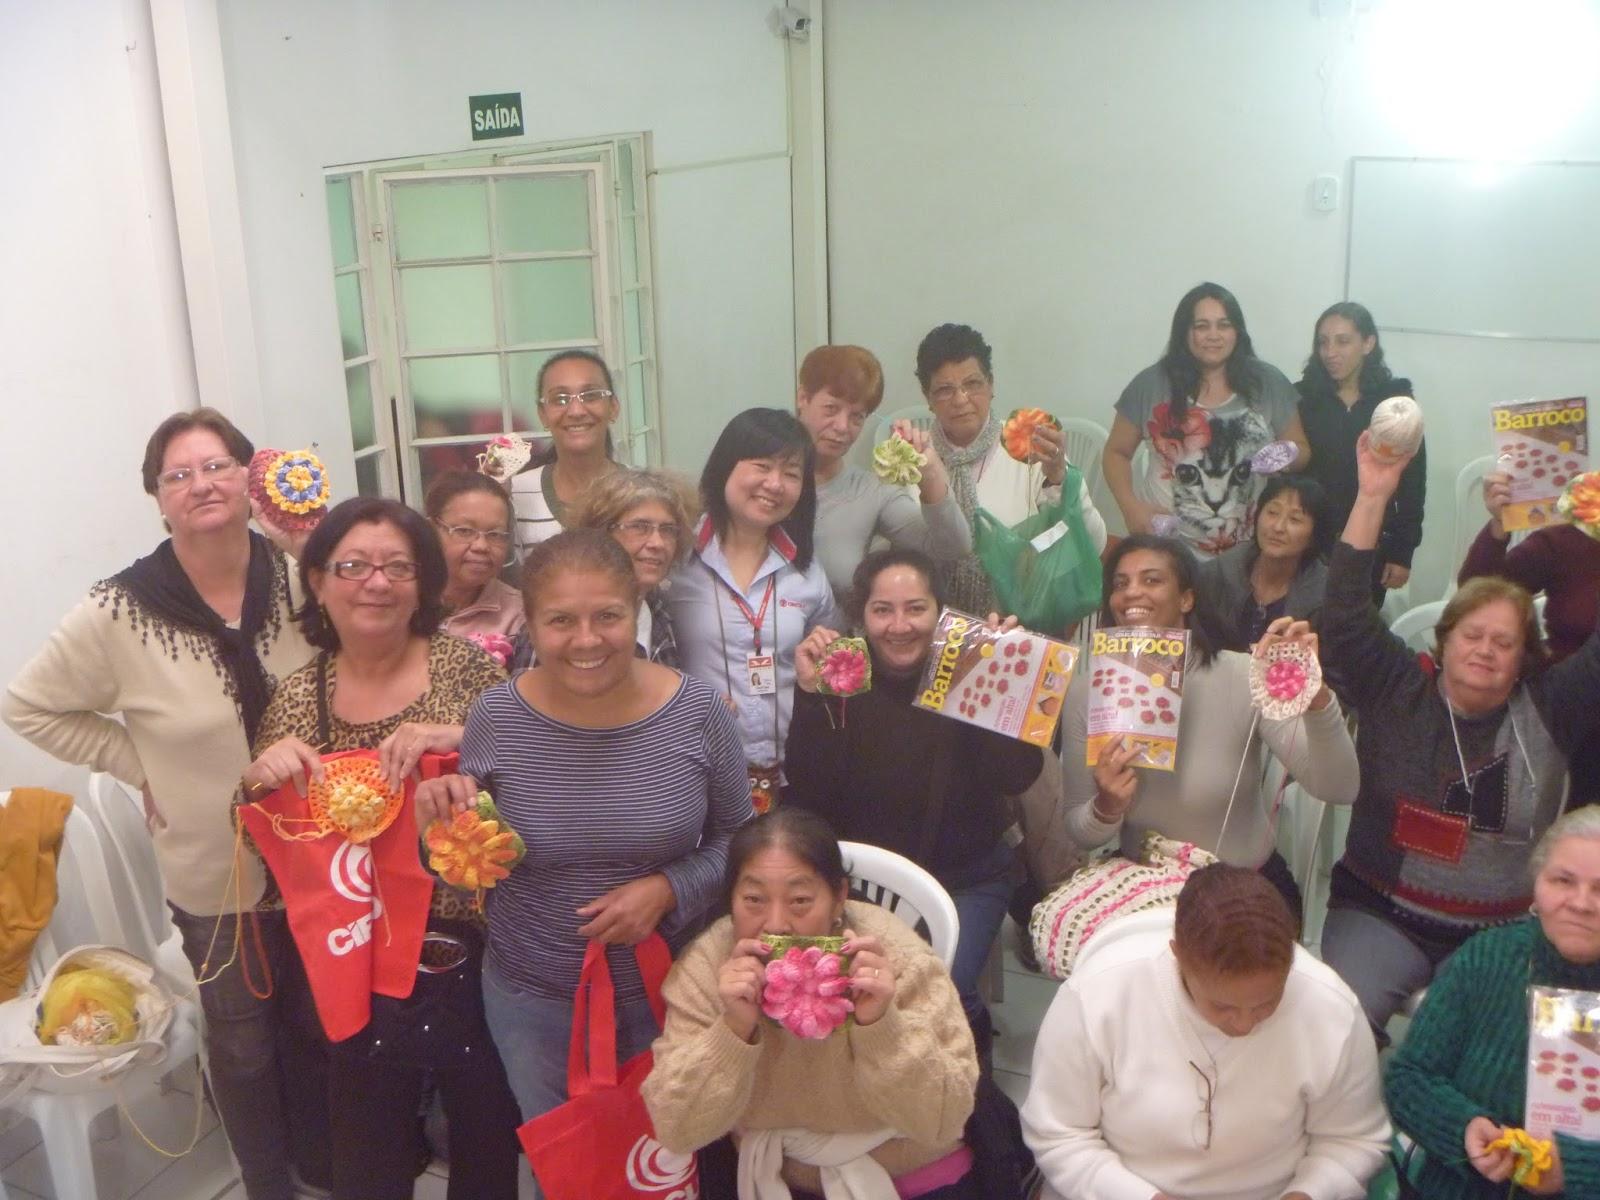 Armario Para Lavanderia Casas Bahia ~ Cristina Luriko WORKSHOP IMPERIAL ARTESANATOS SANTO AMARO SP 16 08 2013